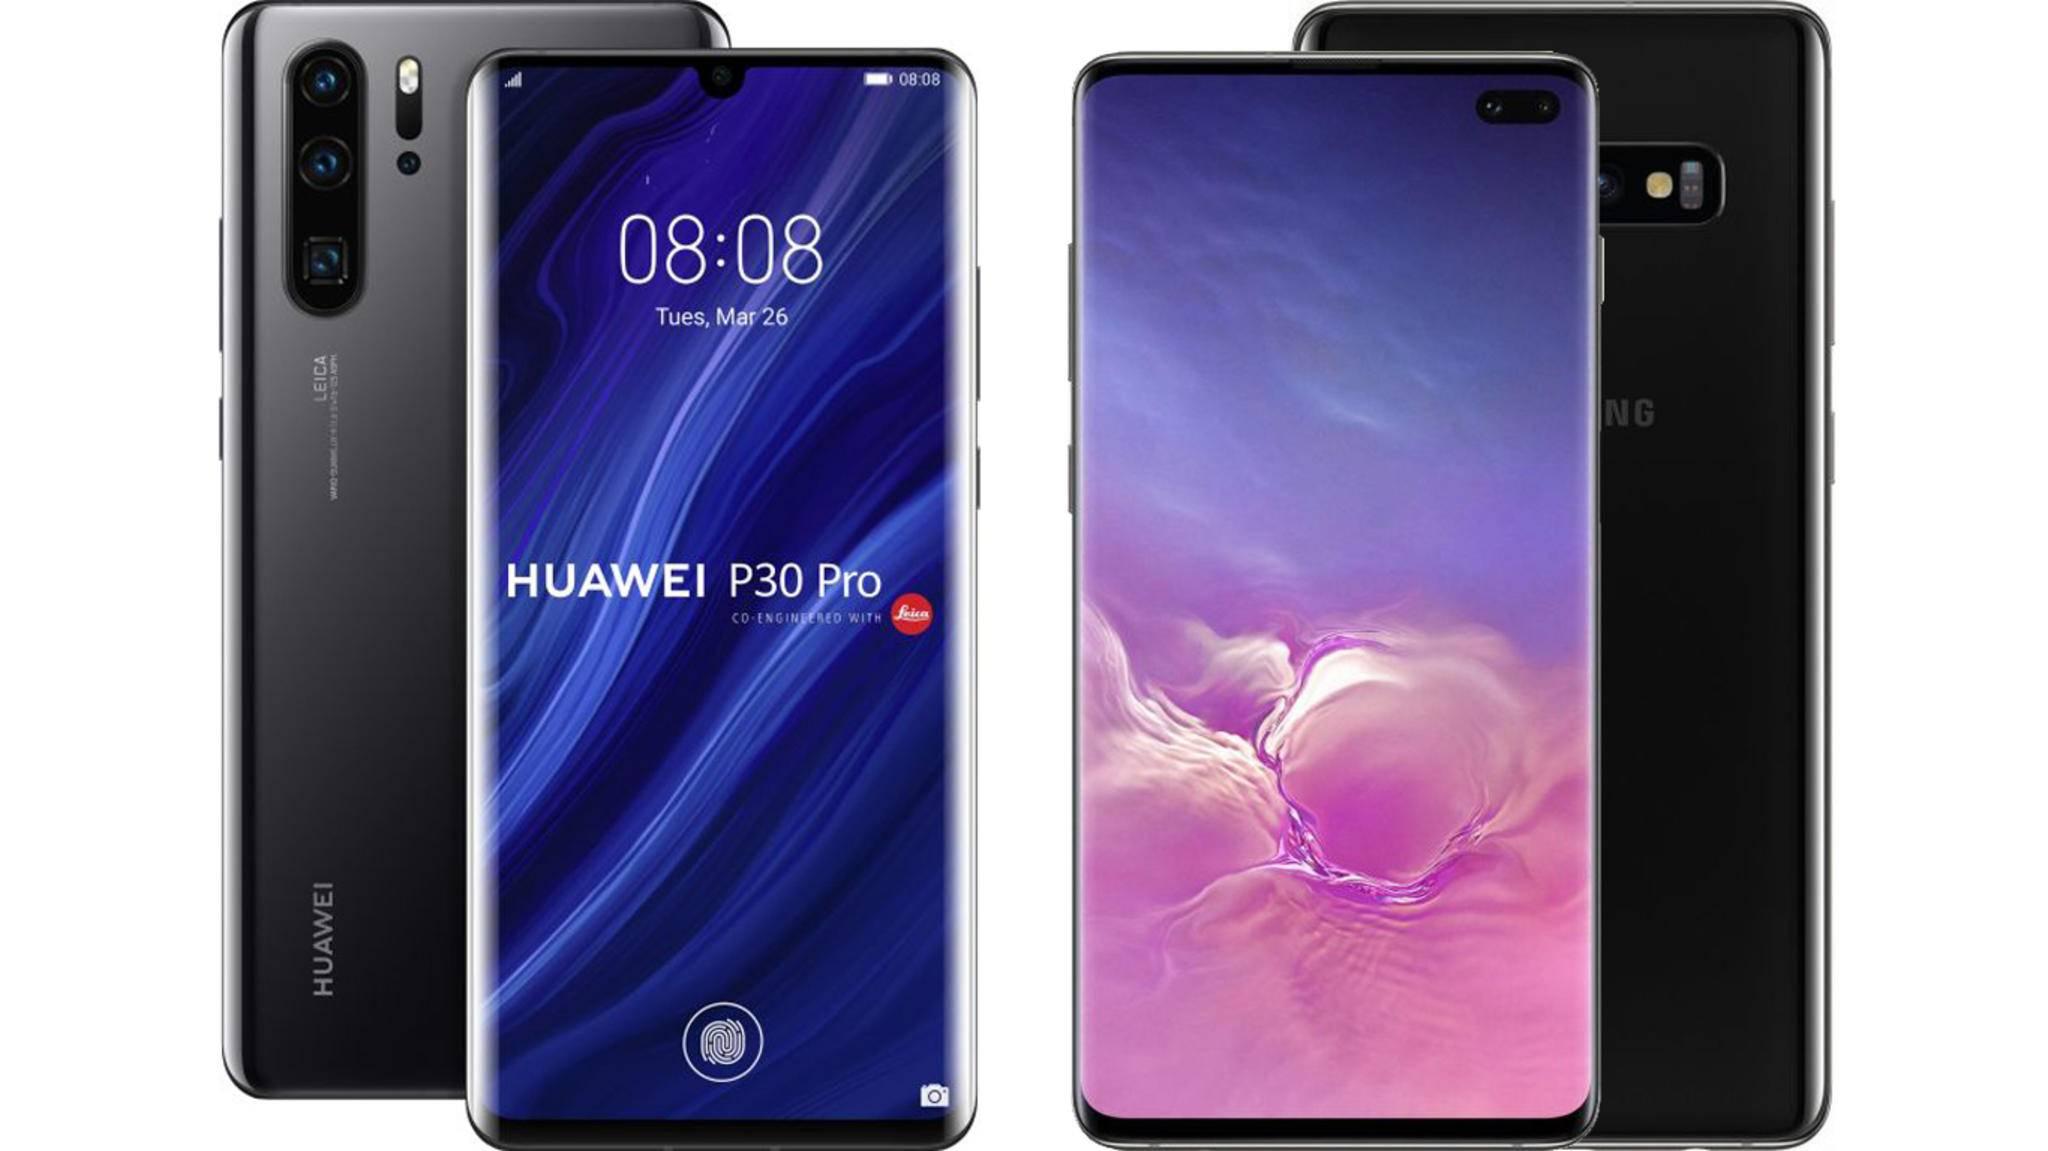 Das Huawei P30 Pro fordert das Galaxy S10 Plus heraus.